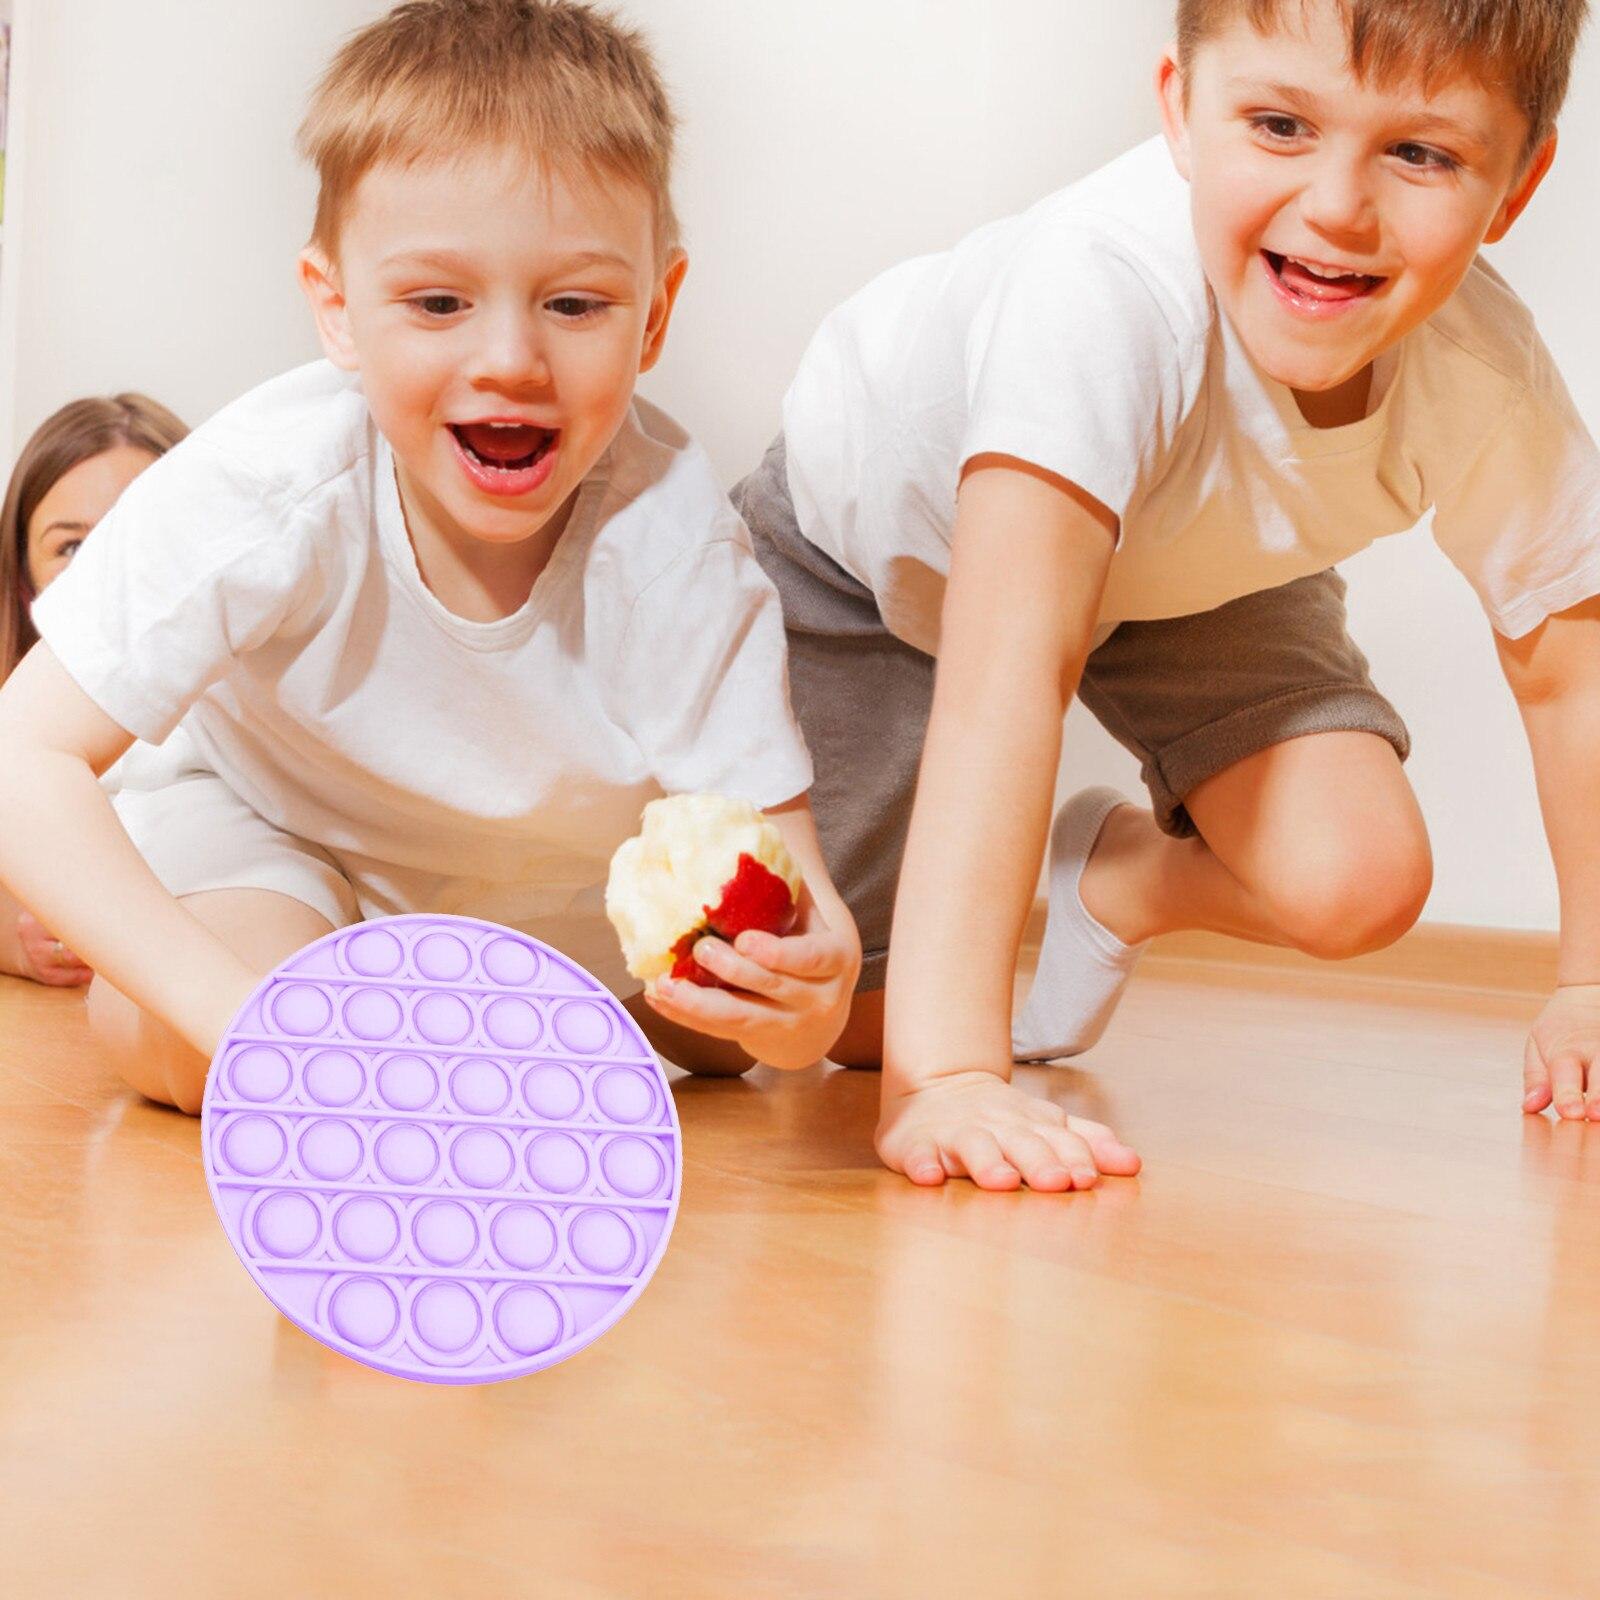 Toy Bubble-Fidget Fidget-Sensory Toy-Stress Relief Adult Glow-In-The-Dark Push Kids img5